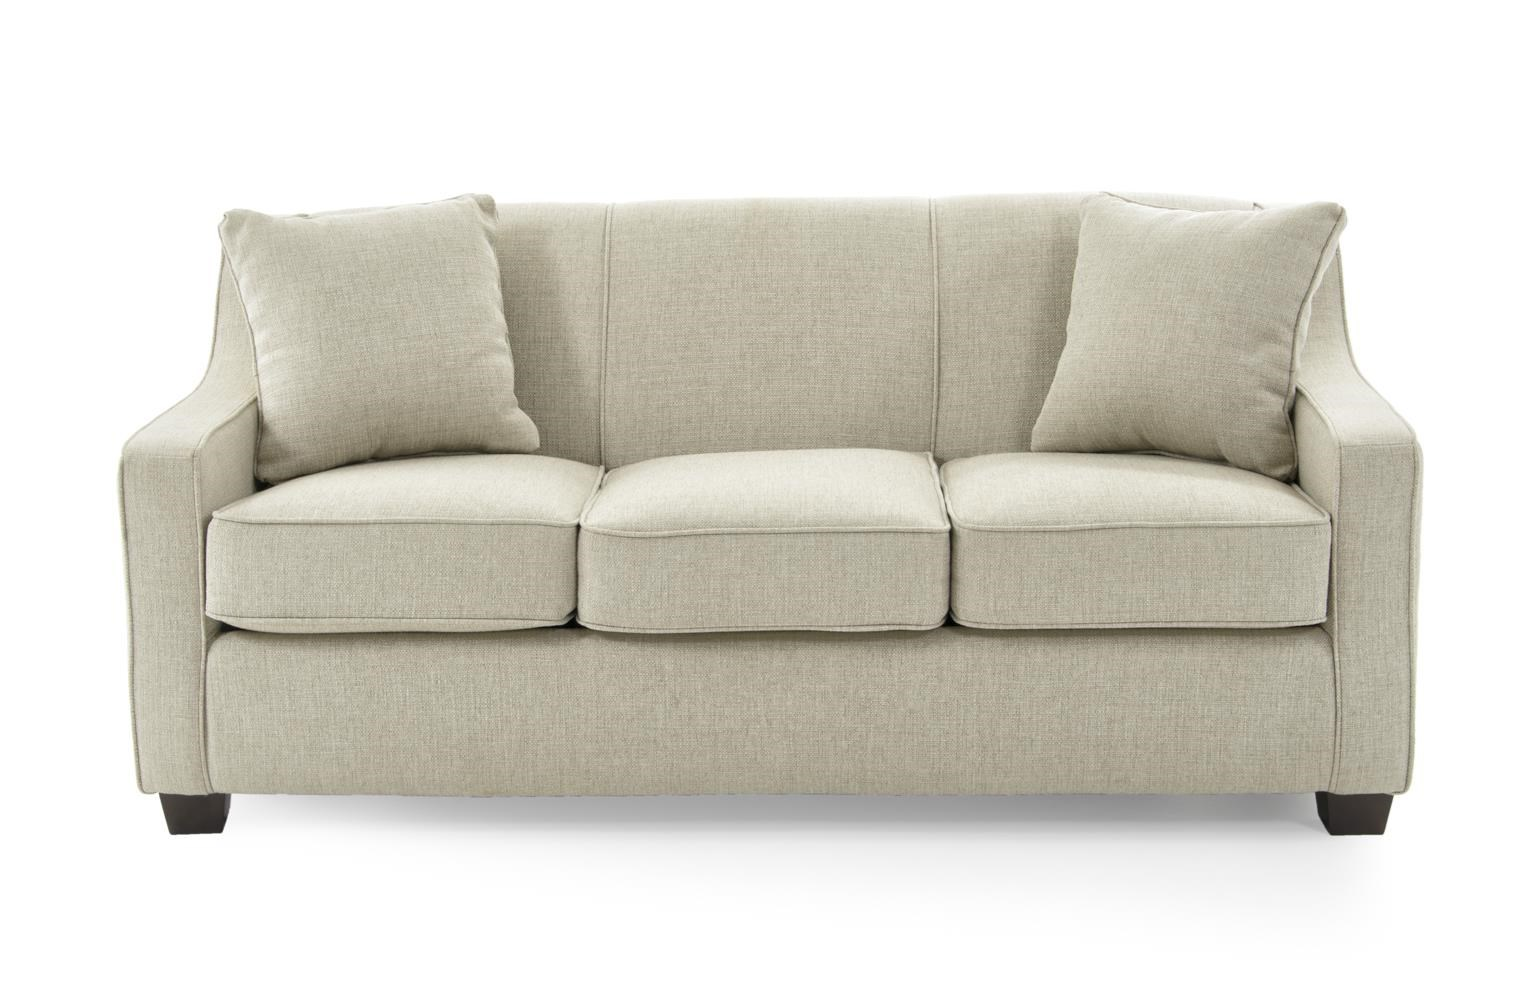 best full size sleeper sofa gosford next reviews home furnishings marinette air dream